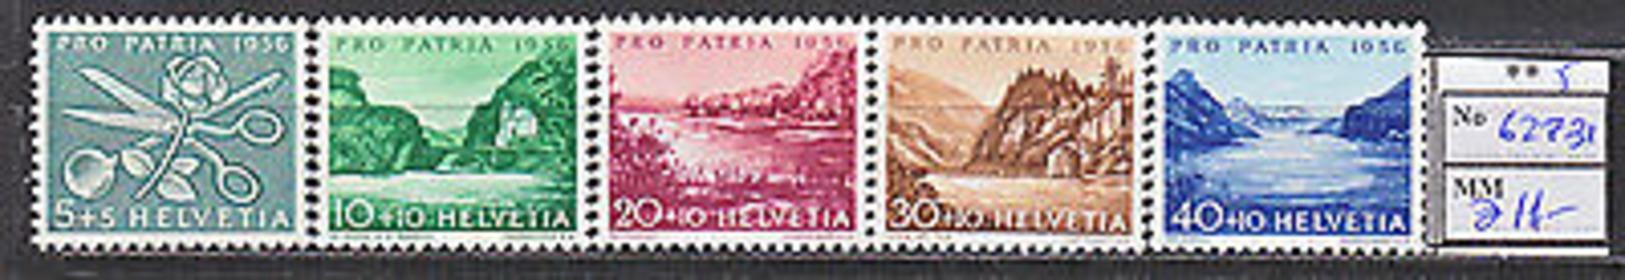 MTA0238.Switzerland 1956 MNH 5v CV 11 Eur Nature Roses - Planten